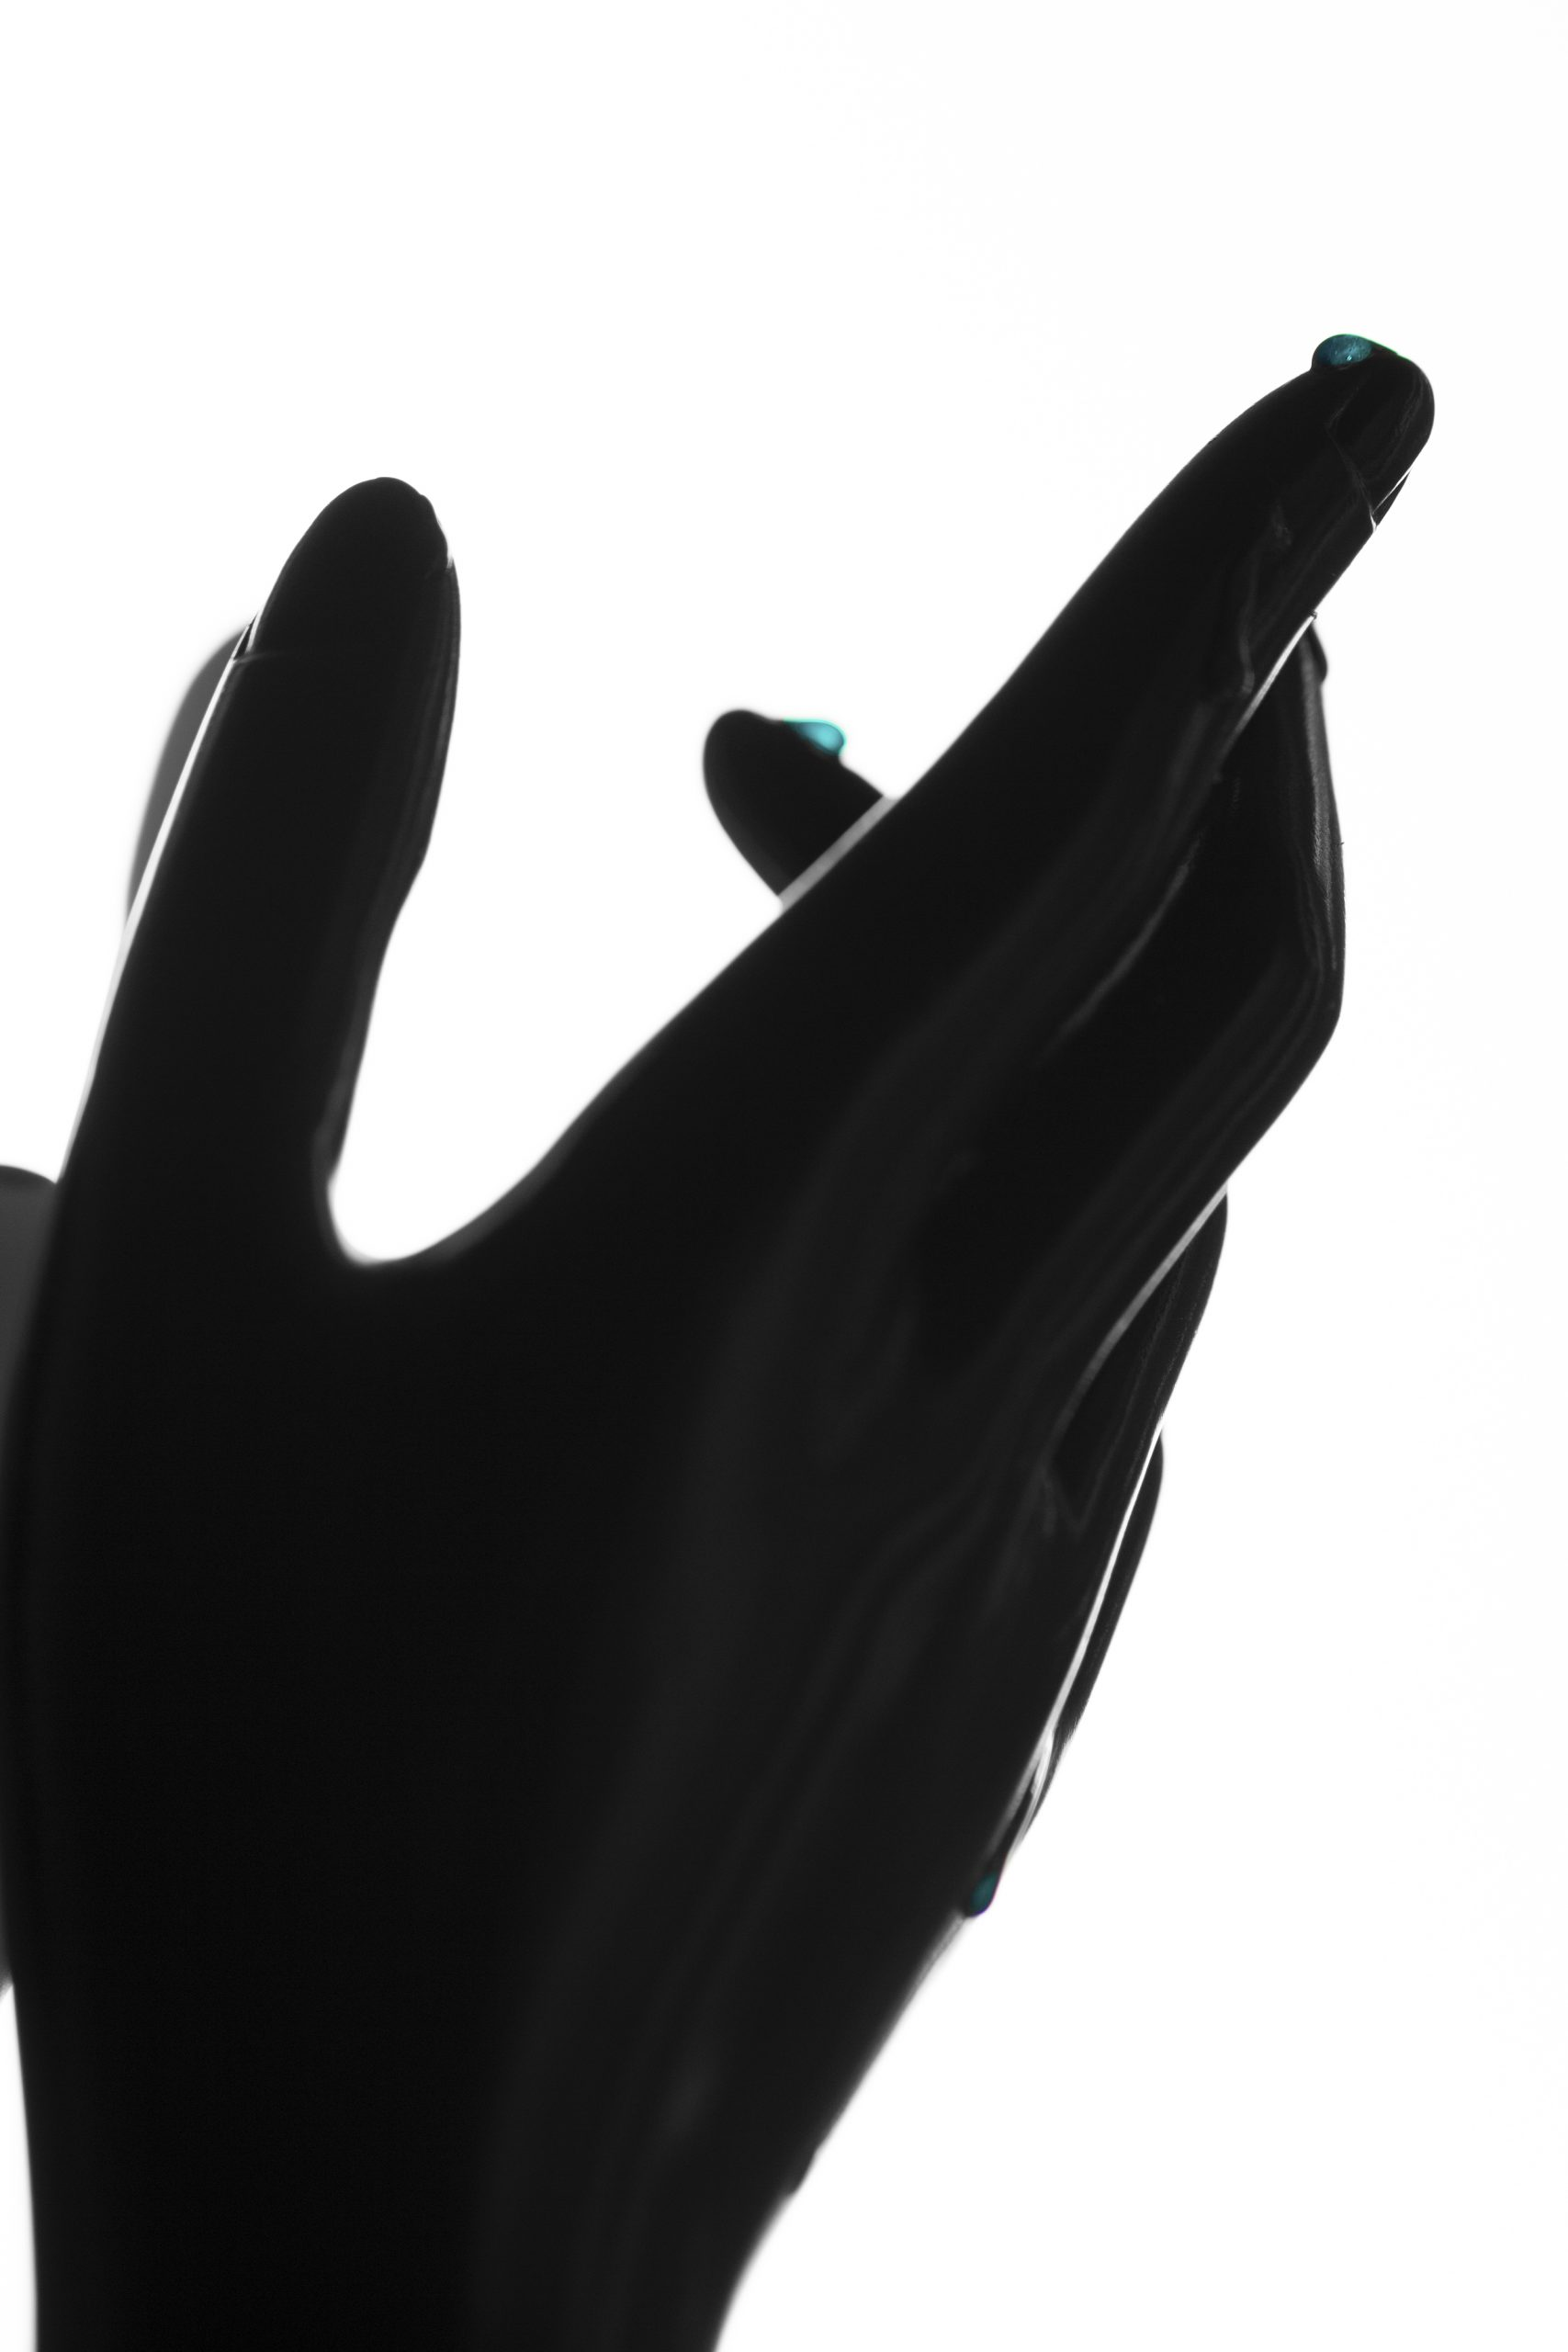 Earth-black4-1